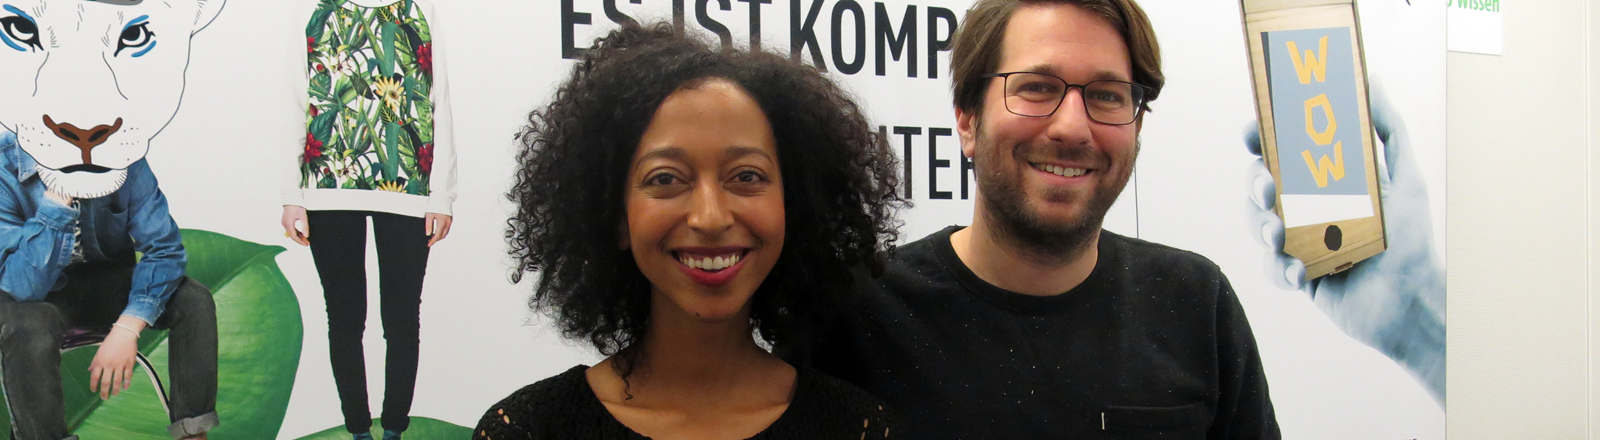 Buchautorin Melanie Raabe und Moderator Sebastian Sonntag.